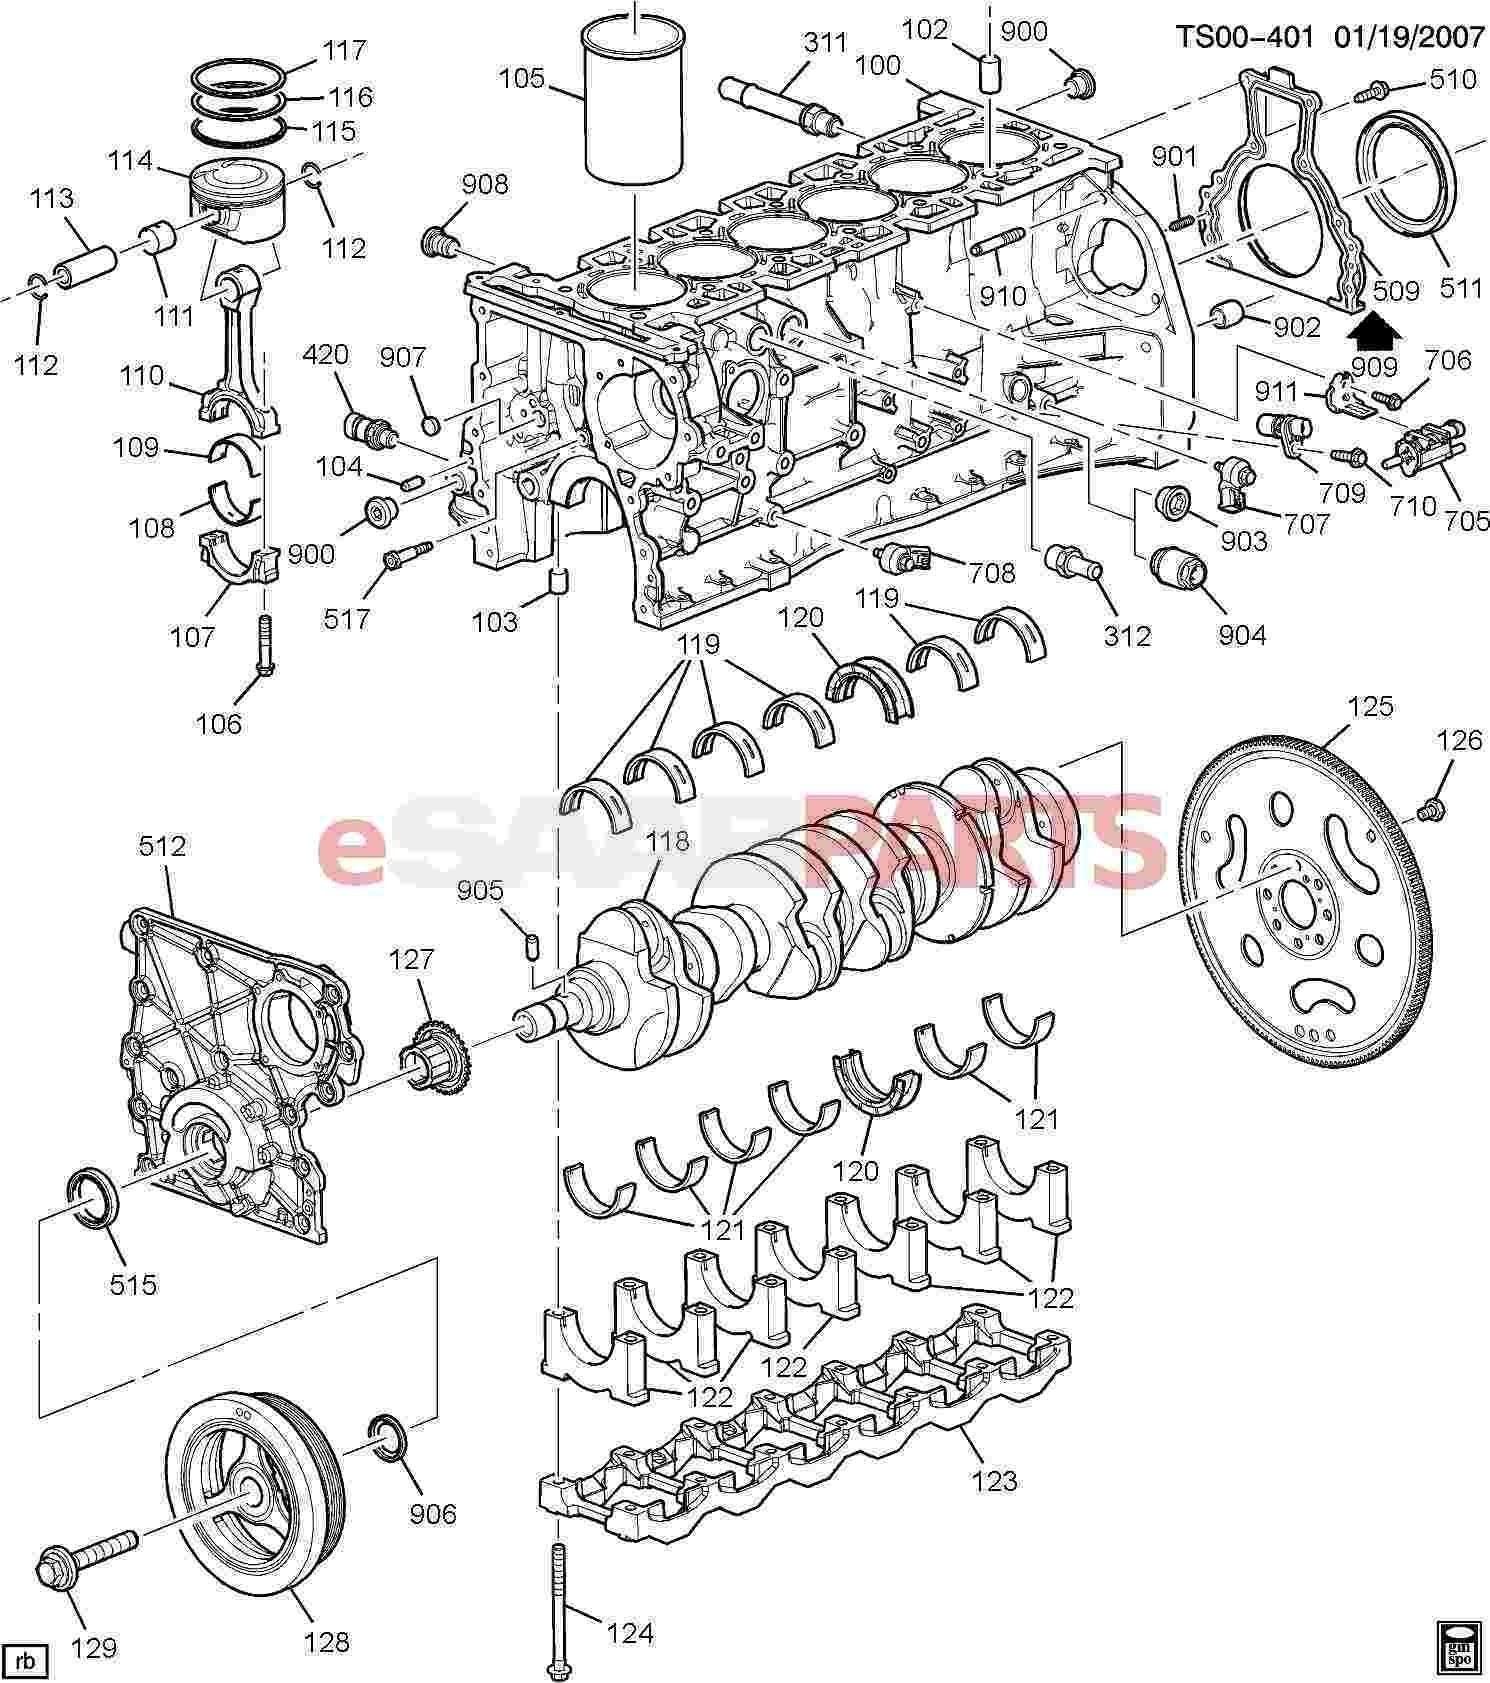 2001 Saab 9 5 Wiring Diagram Wiring Diagram Explained D Explained D Led Illumina It